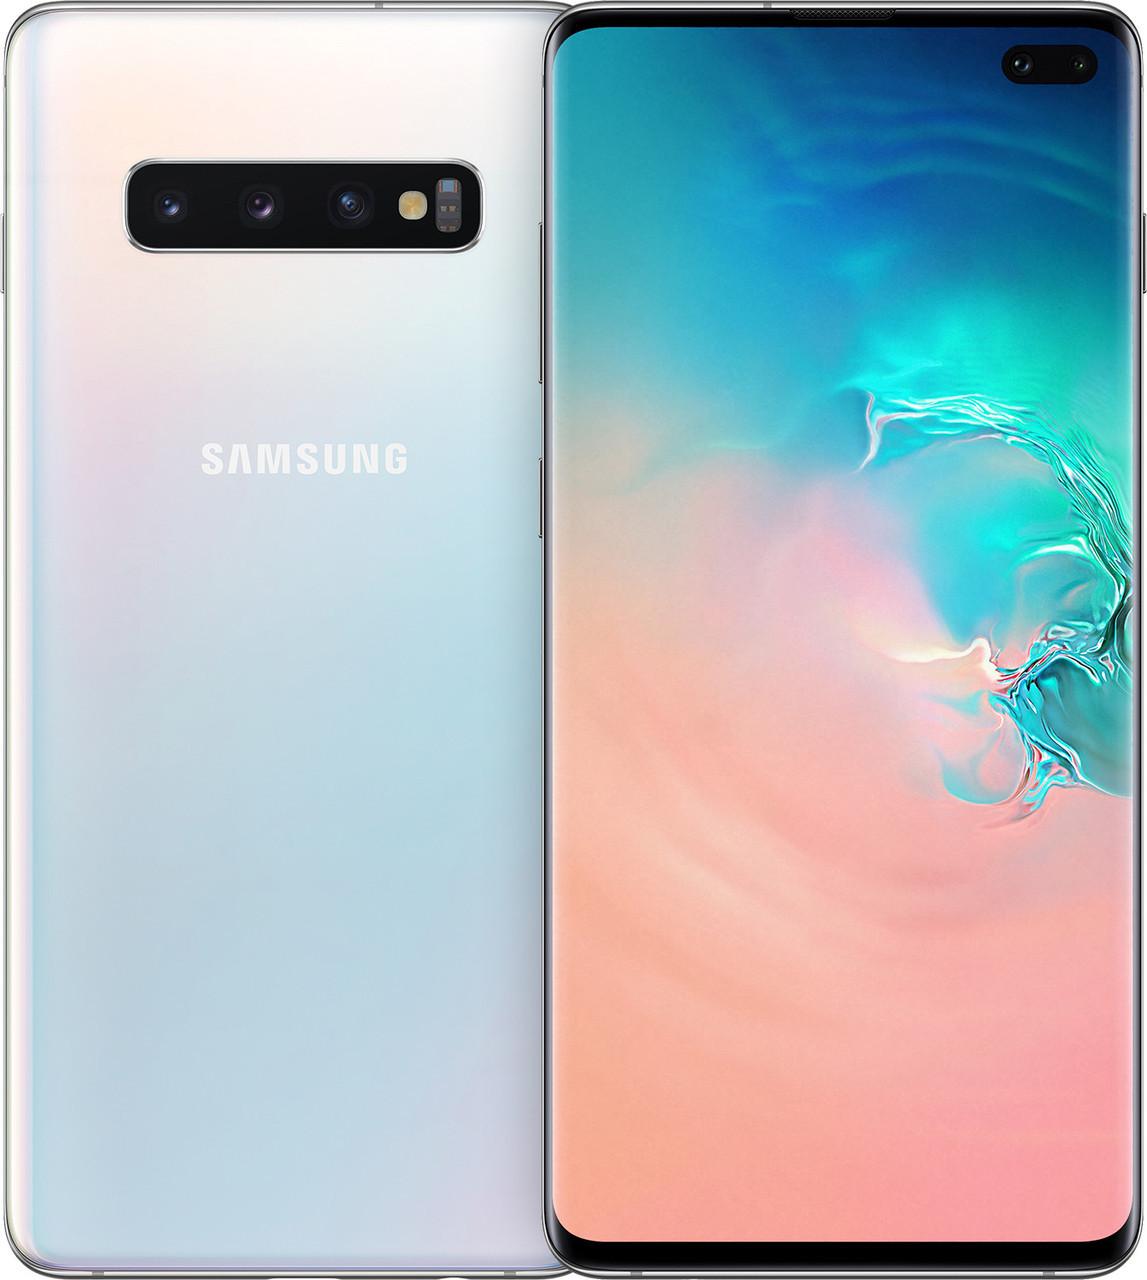 Samsung Galaxy S10 Plus Prism White